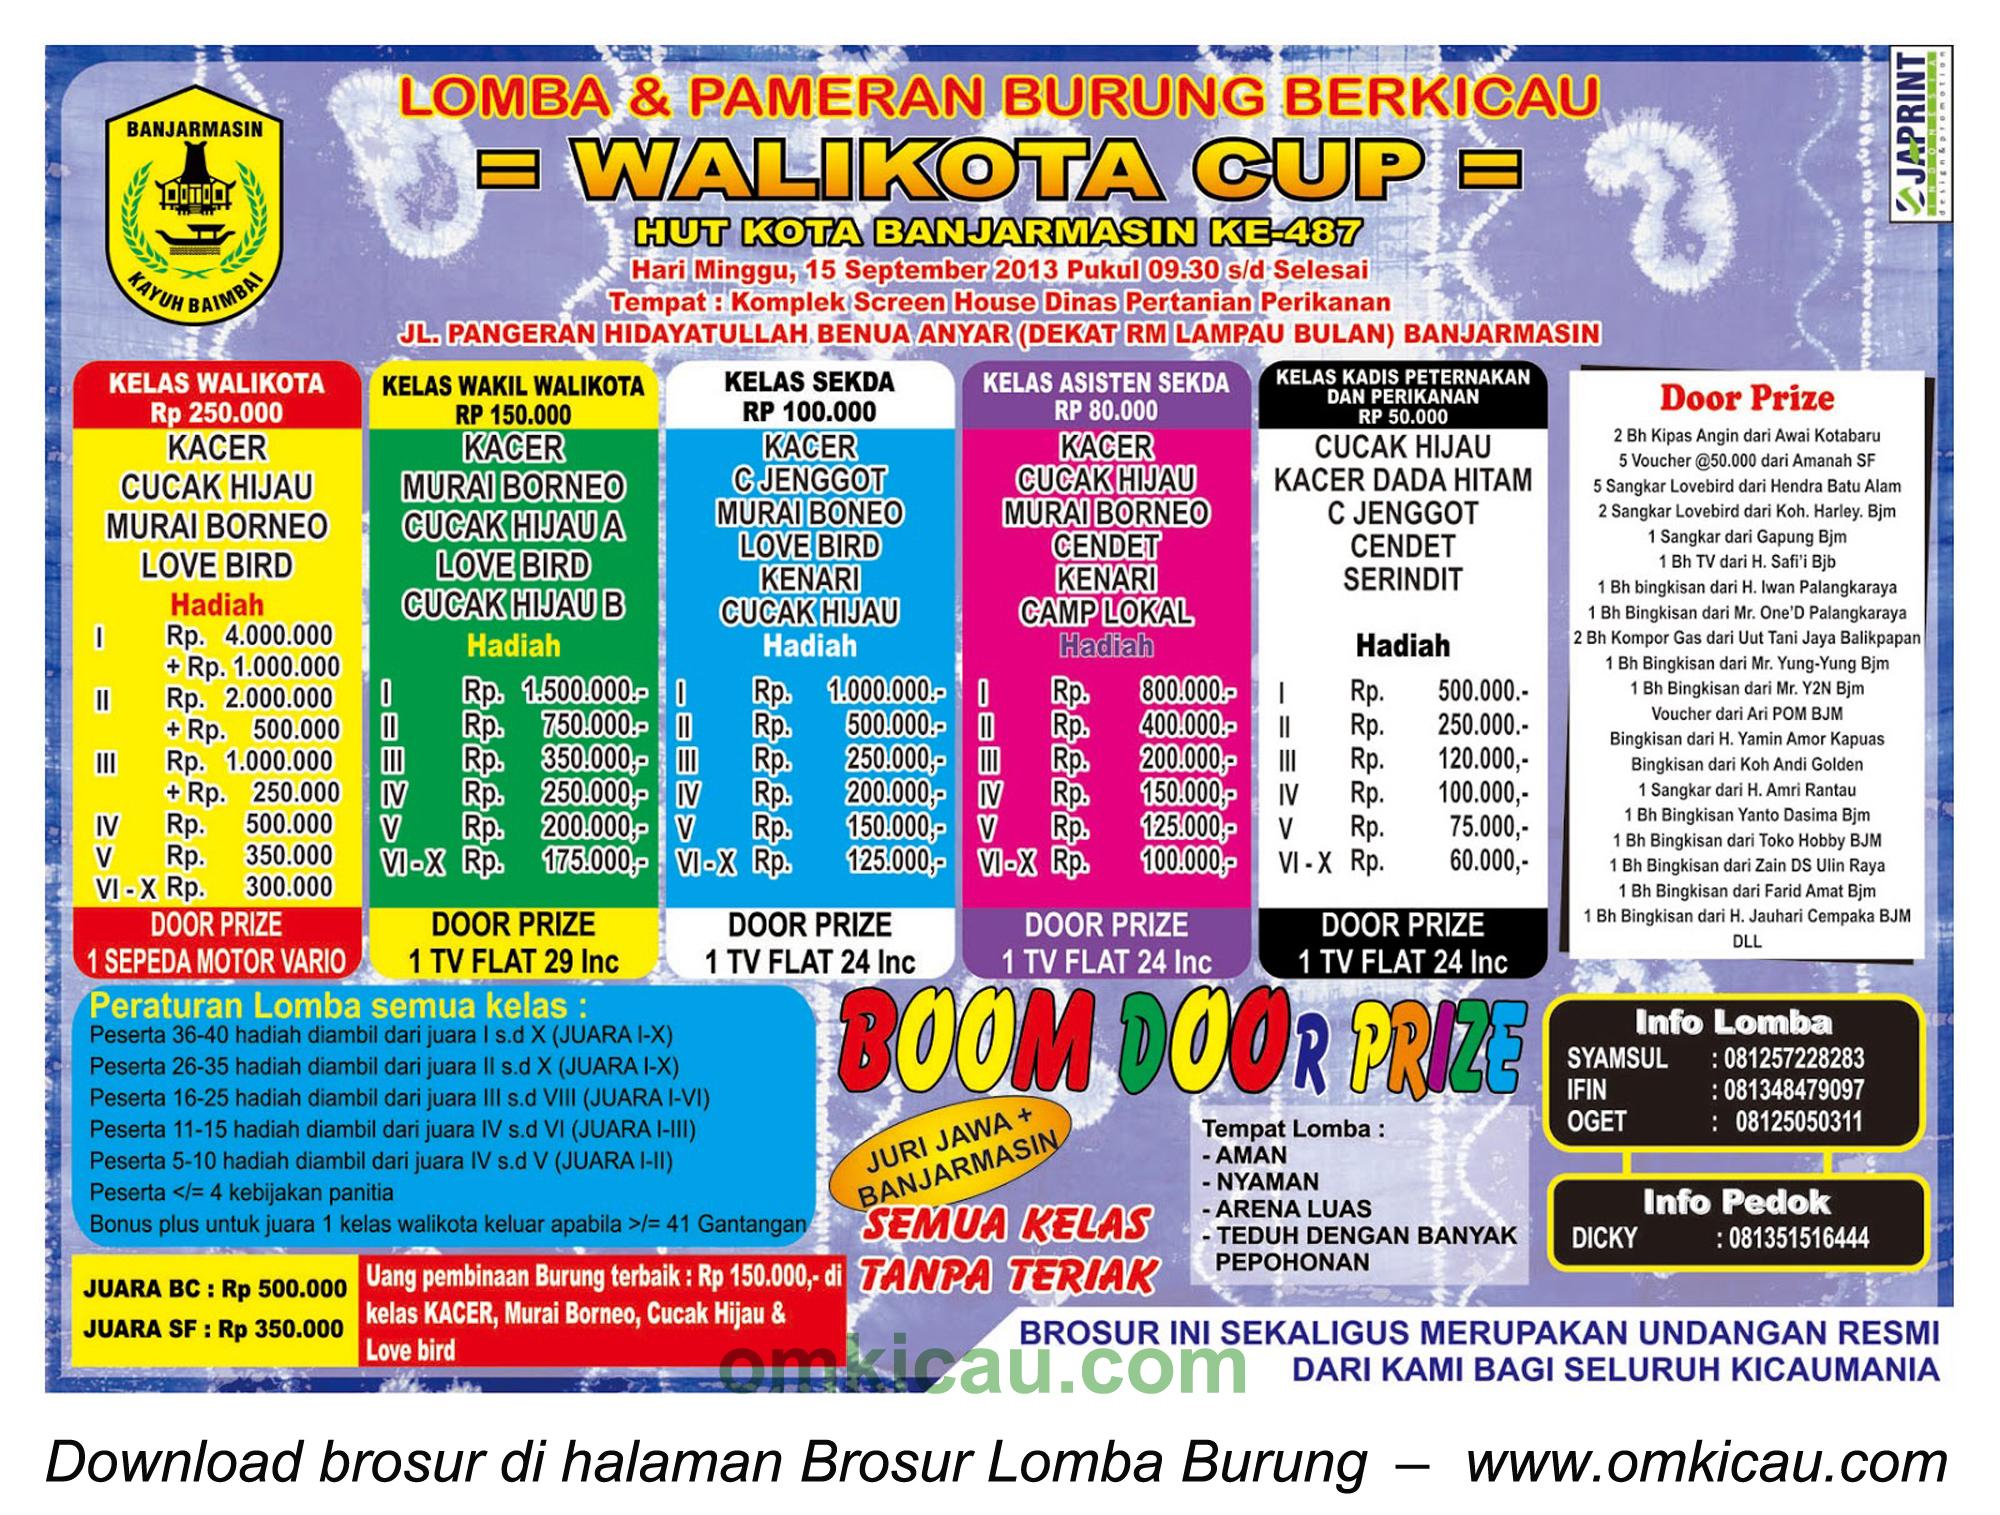 Brosur Lomba Burung Wali Kota Cup, Banjarmasin, 15 September 2013